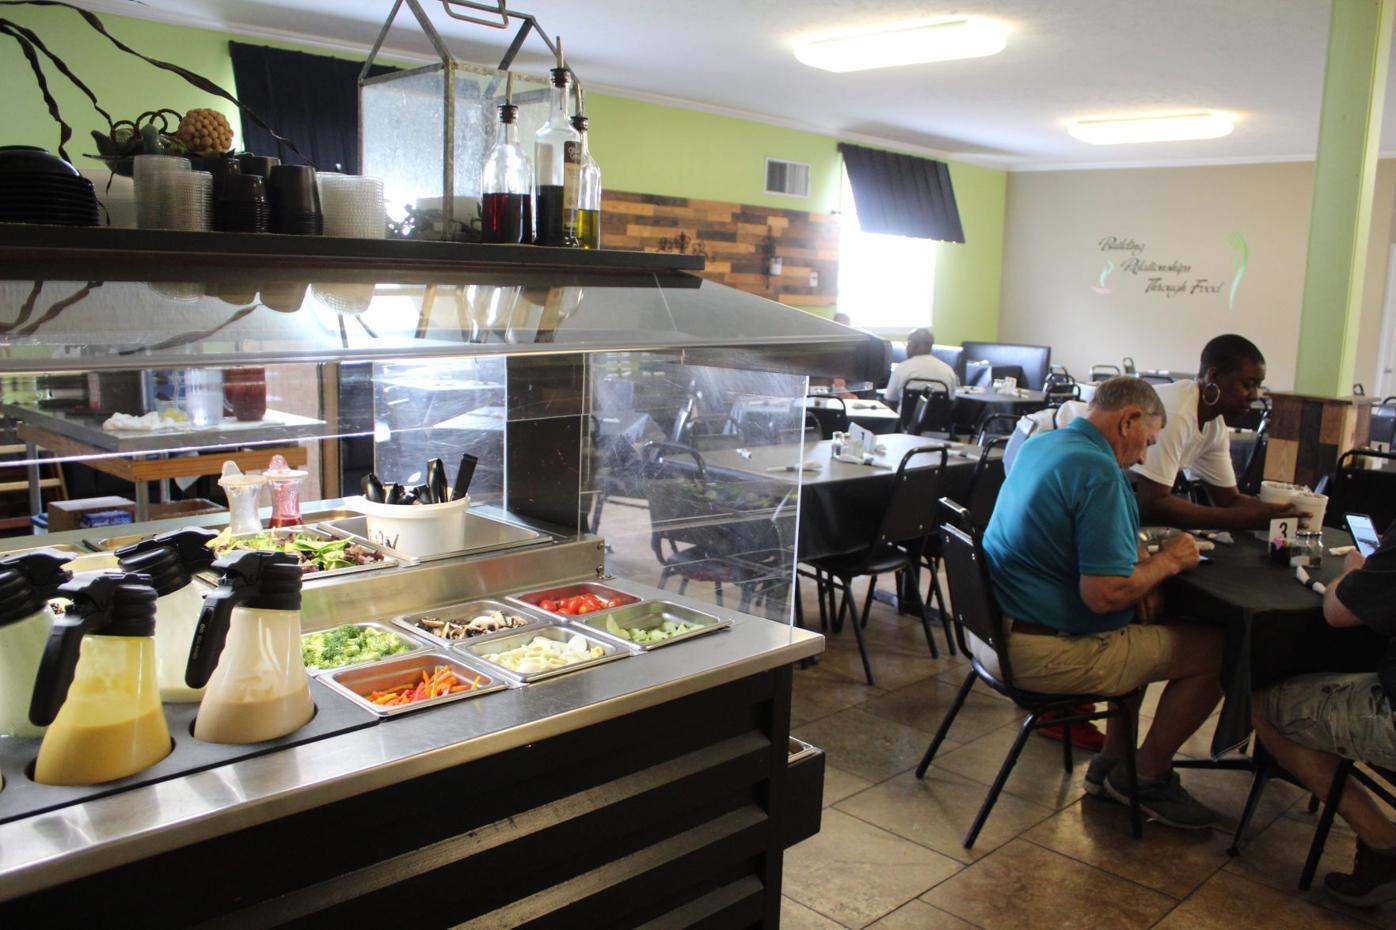 mcj-2020-09-30-news-business-spotlight-indulge-restaurant-dining-room